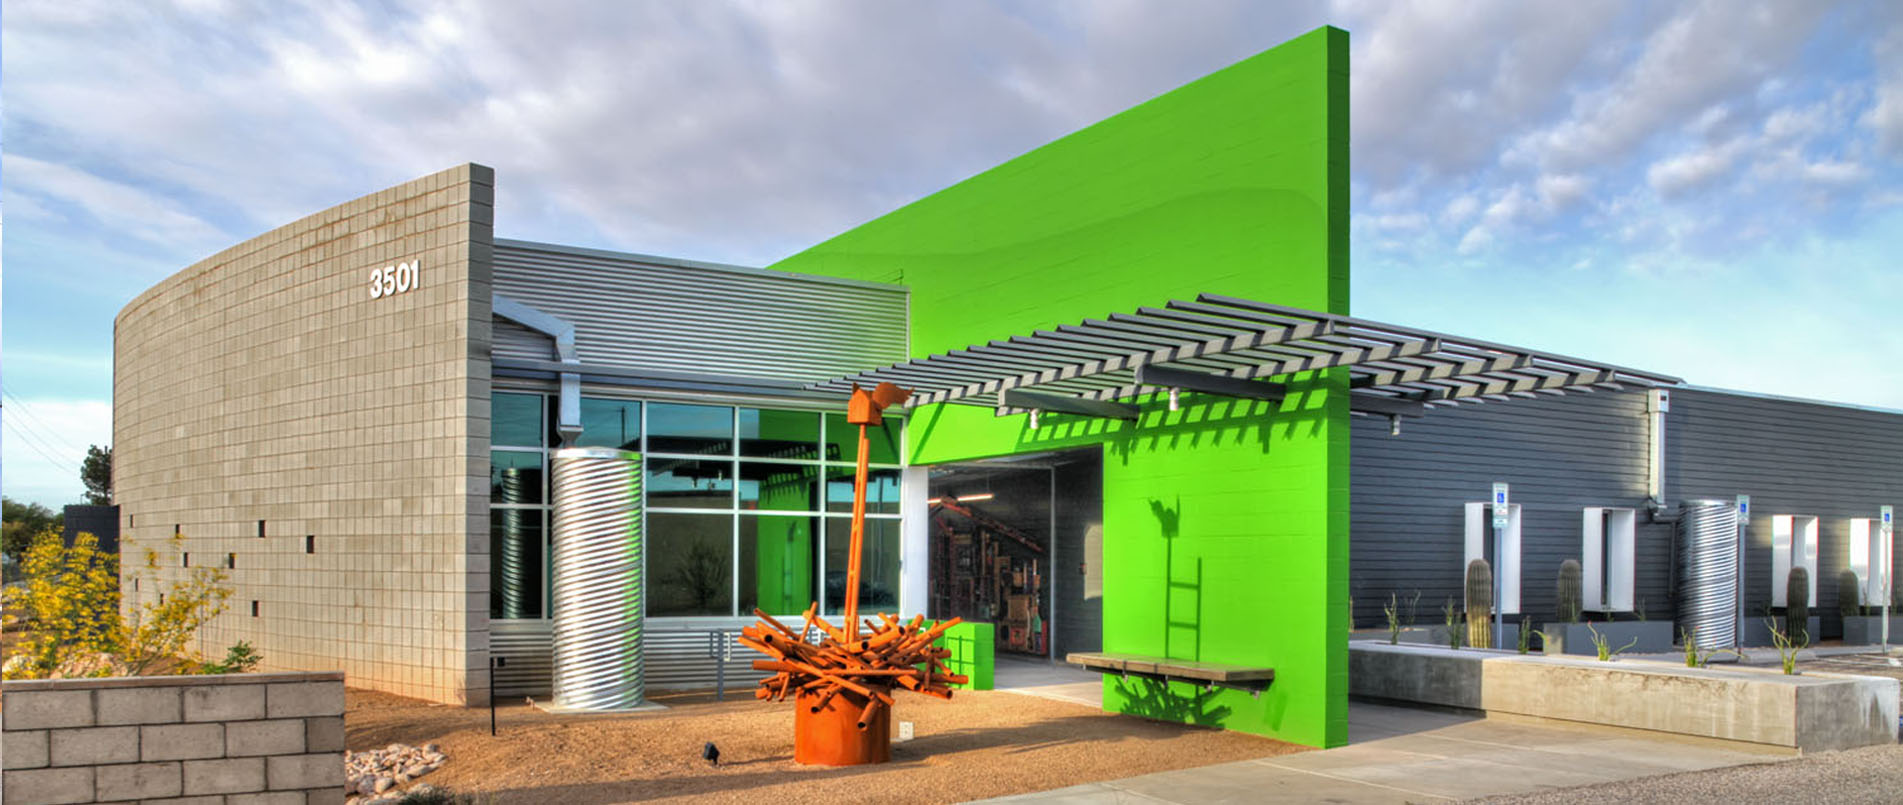 Habitat for Humanity, HQ